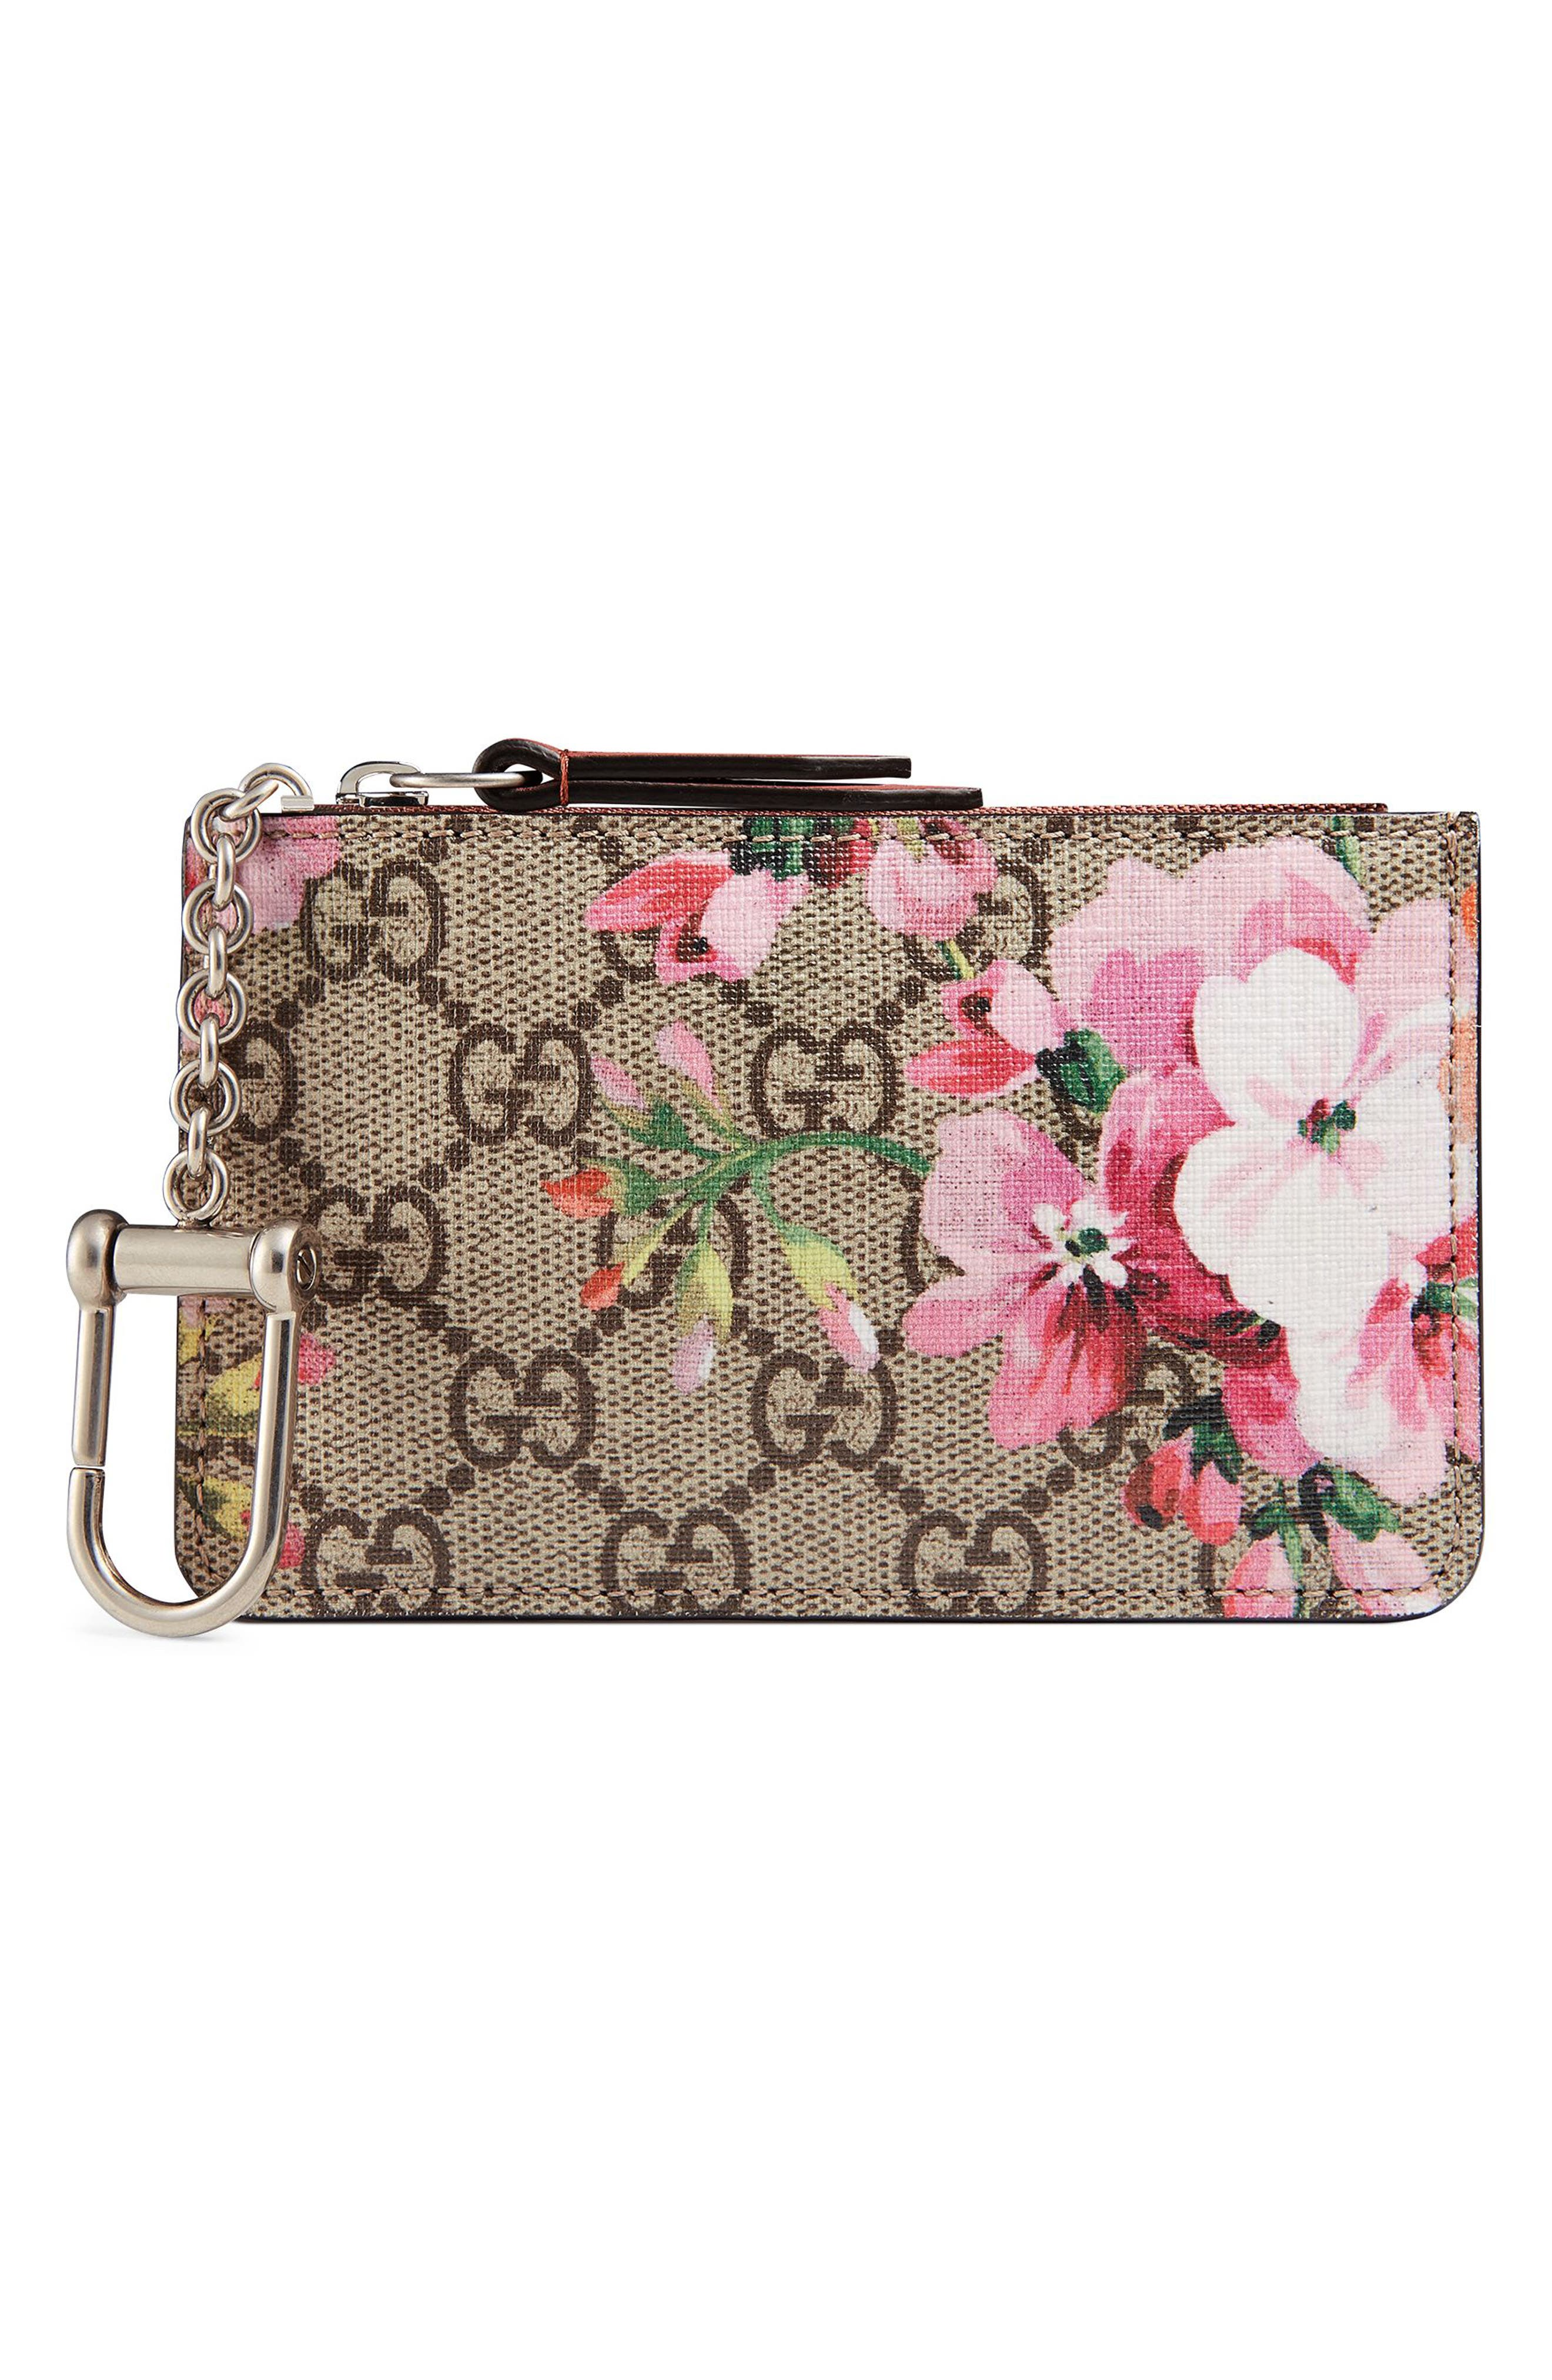 Main Image - Gucci Blooms Key Case